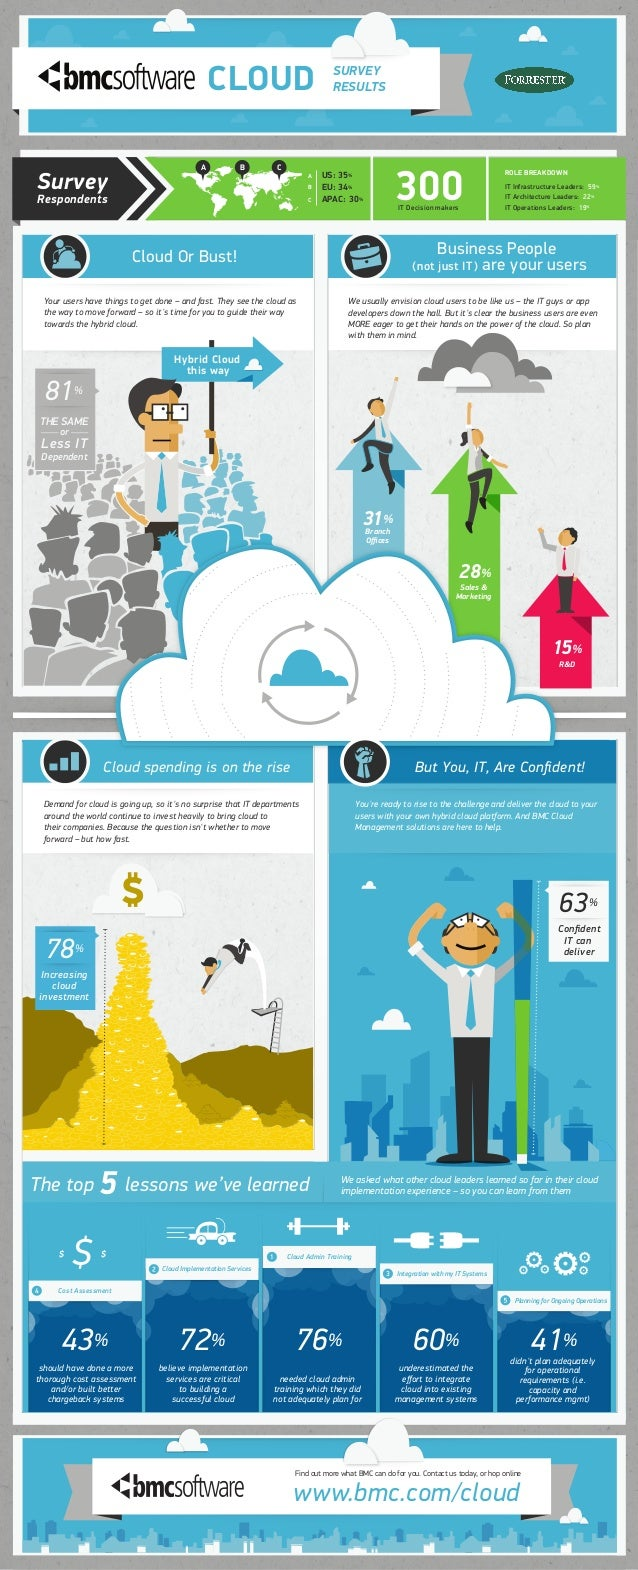 BMC Software Cloud Survey Results Infographic